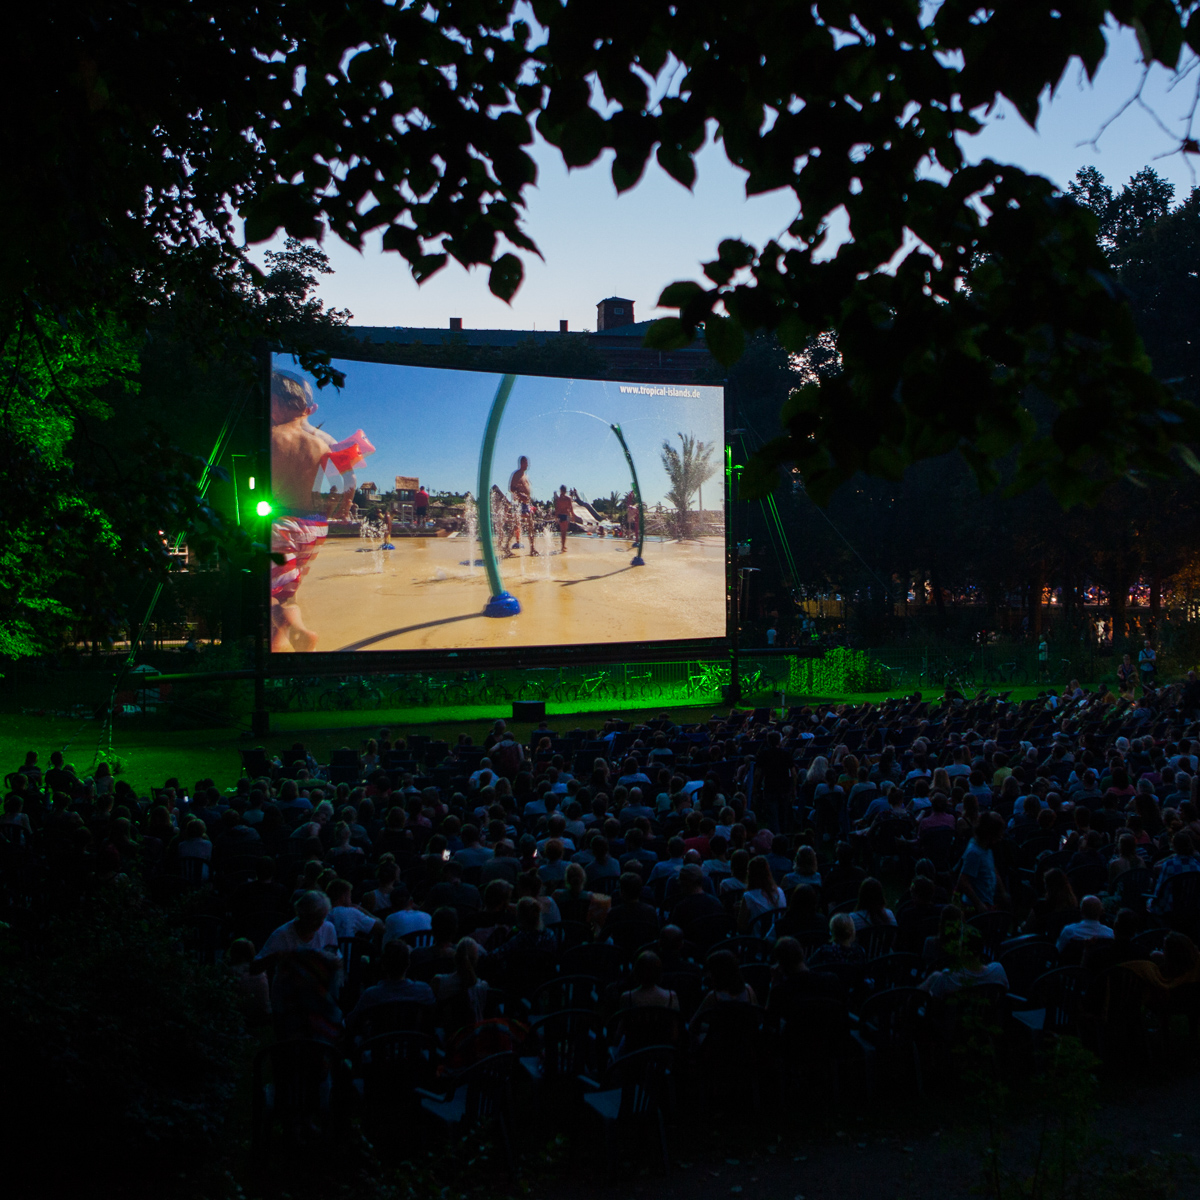 Freiluft Kino Berlin Kreuzberg-2 Kopie